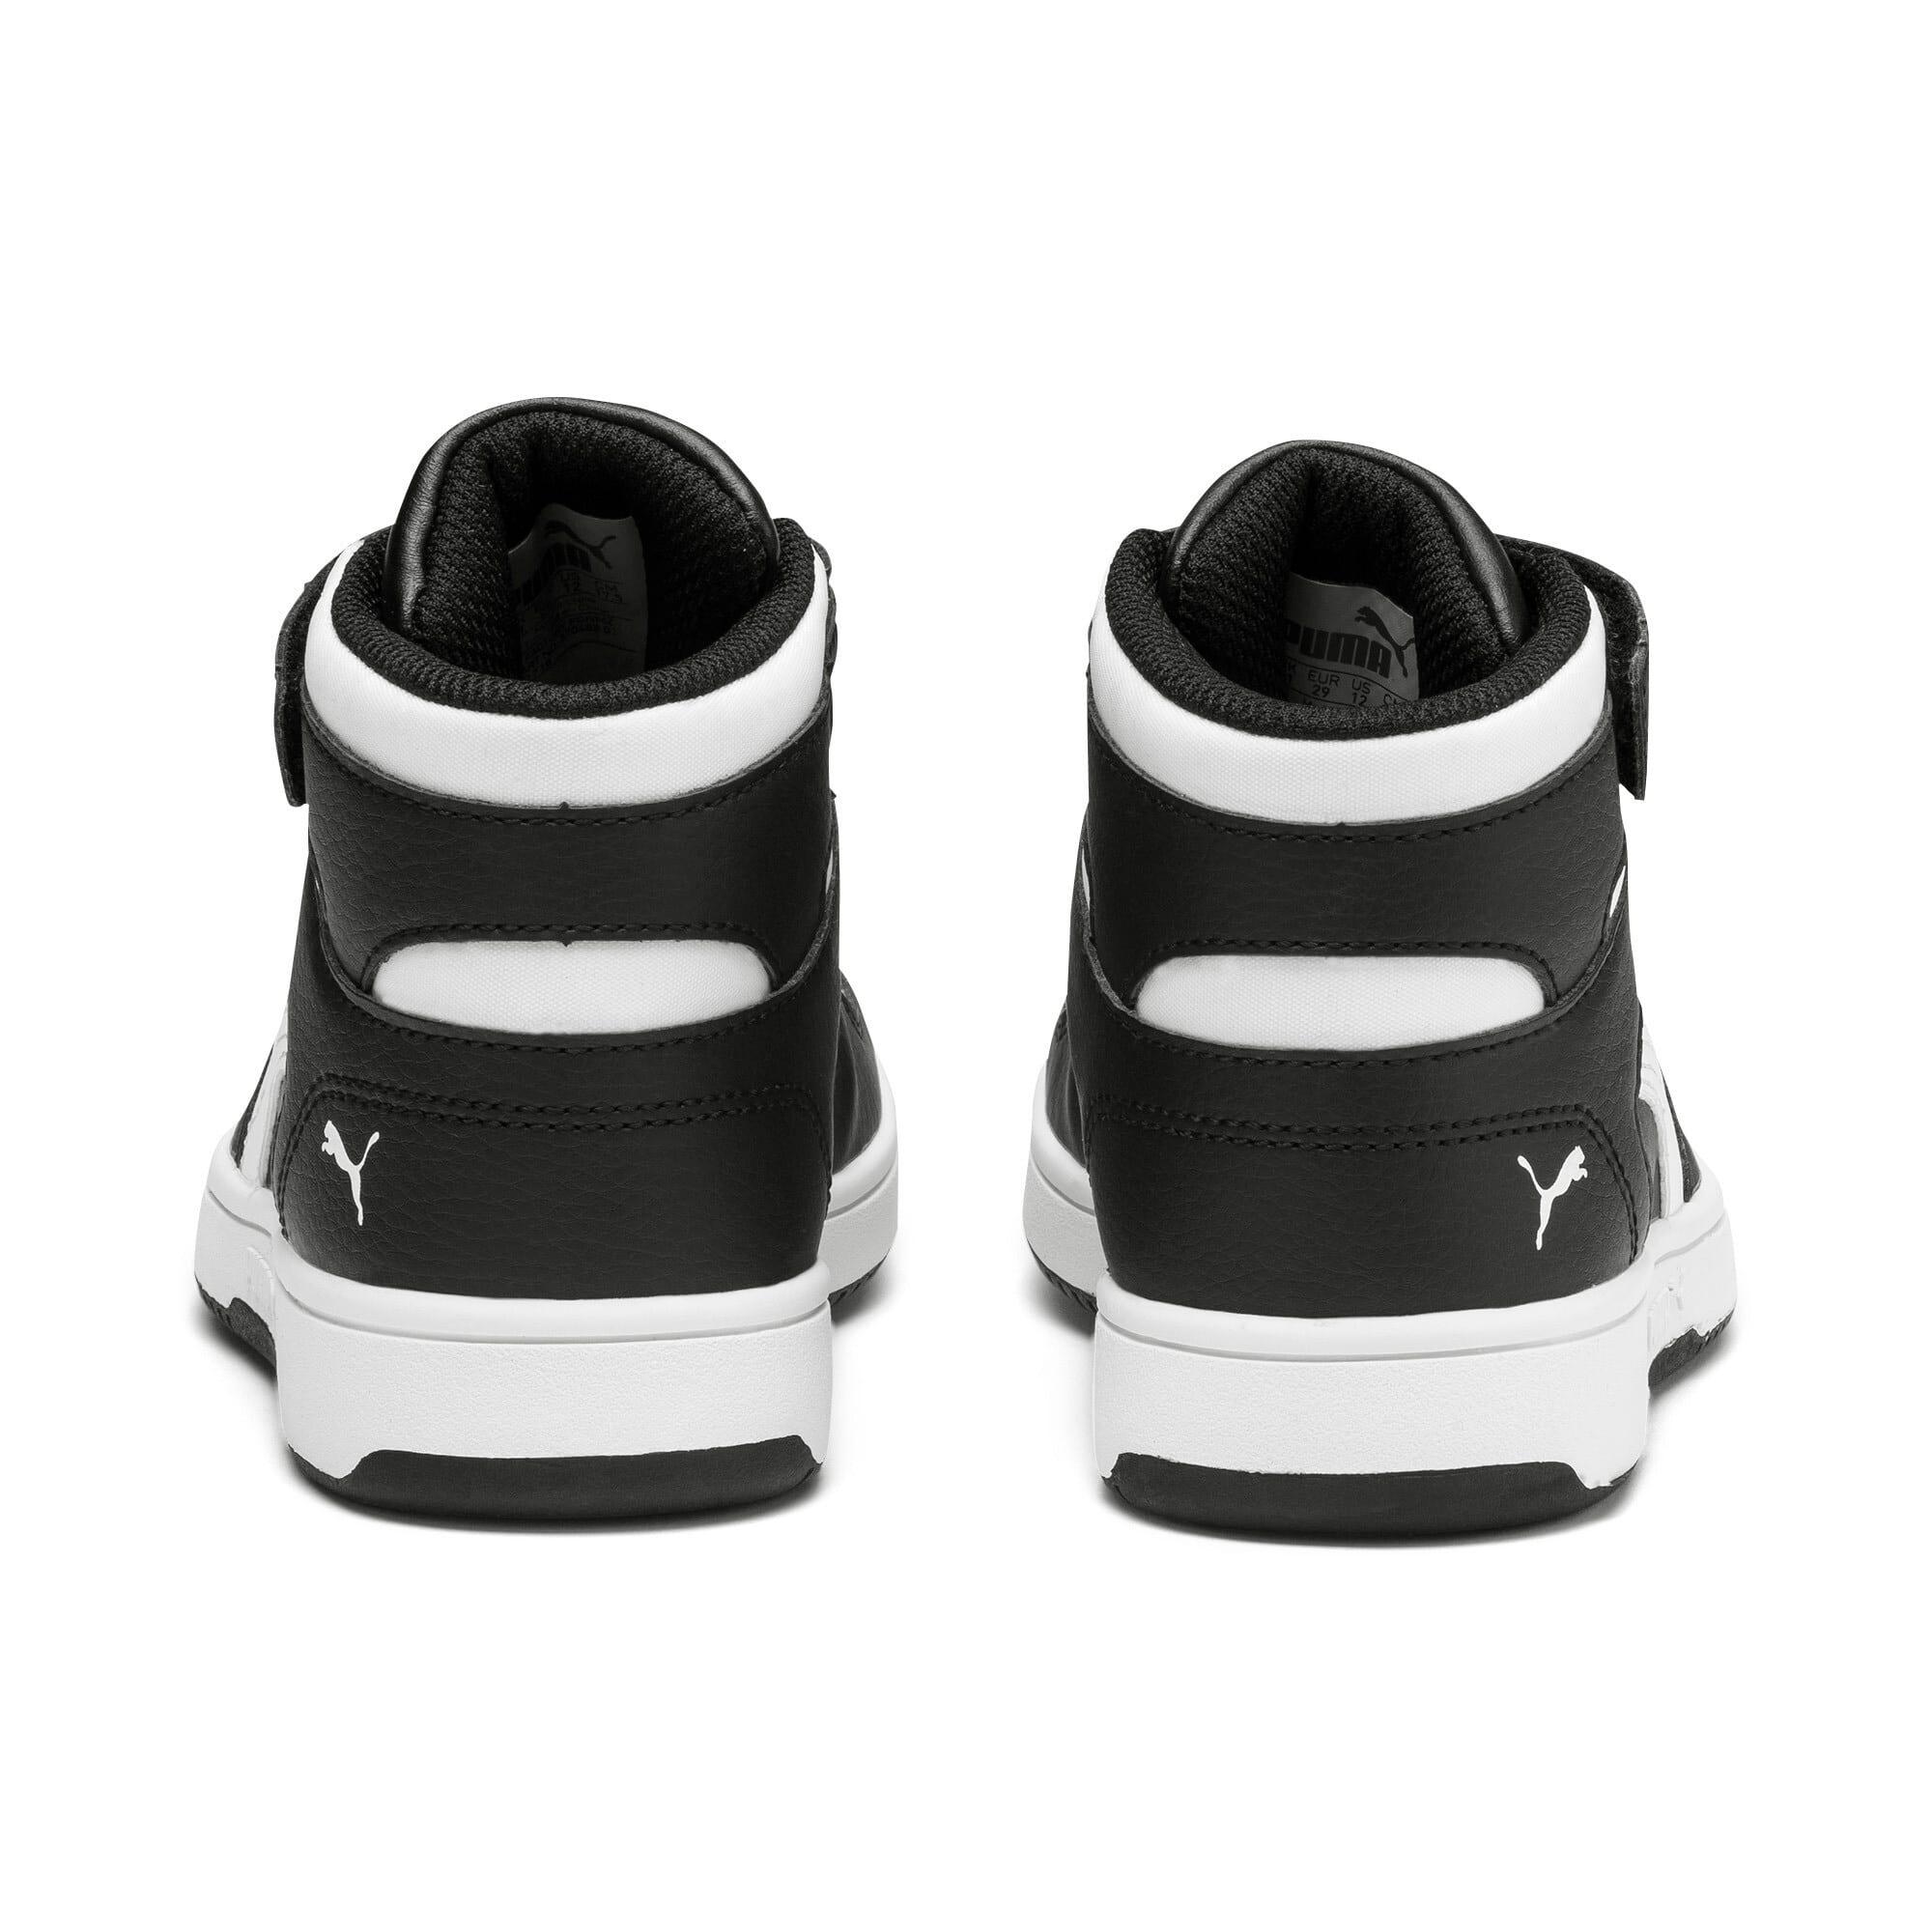 Thumbnail 3 of PUMA Rebound LayUp Little Kids' Shoes, Puma Black-Puma White, medium